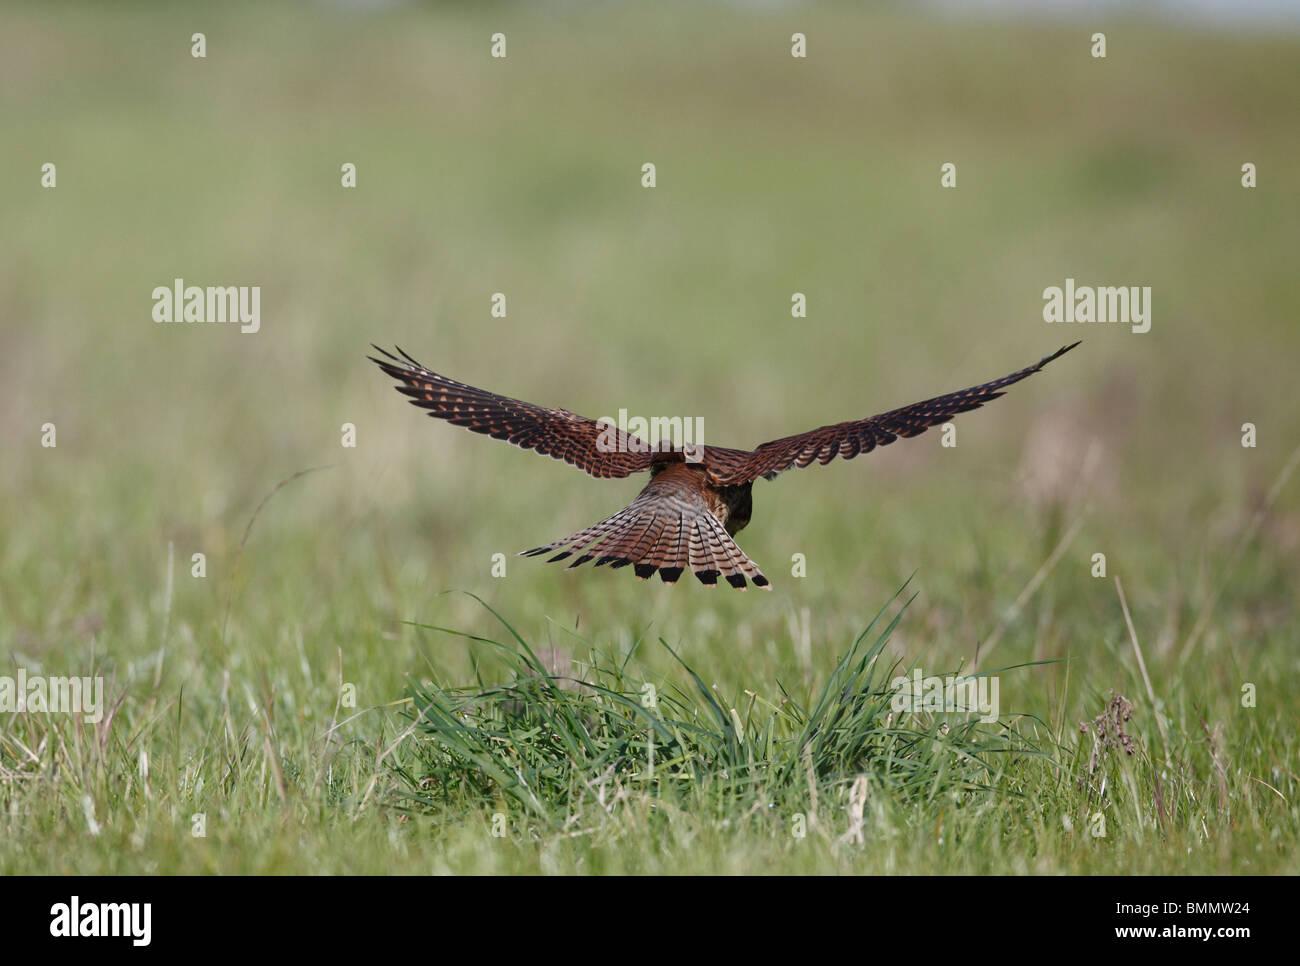 Kestrel (Falco tinnunculus) hovering over long grass backview - Stock Image